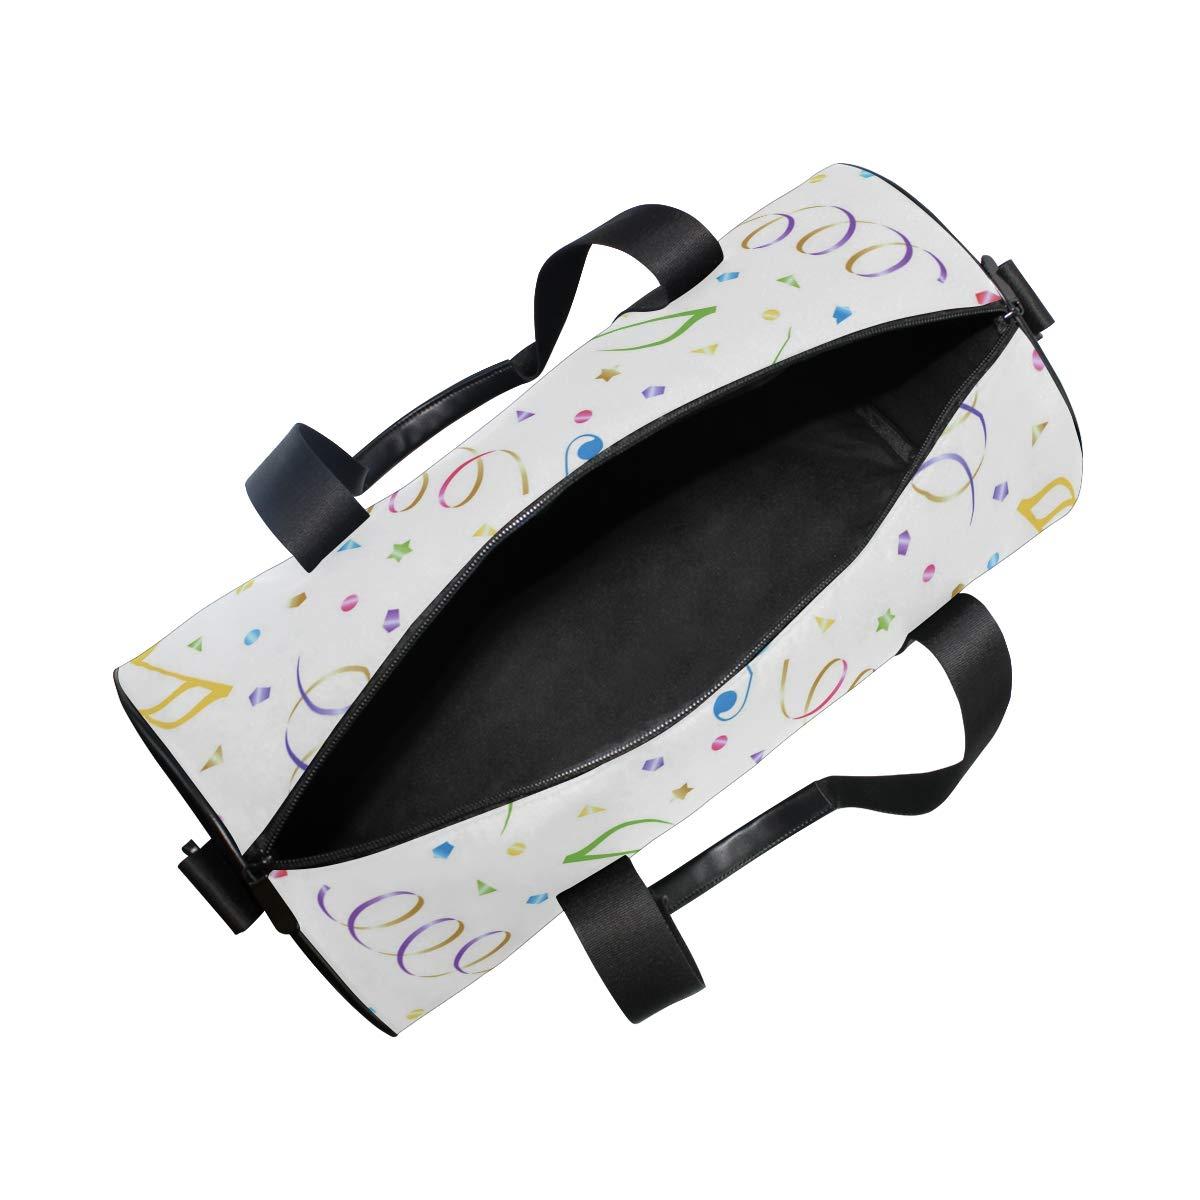 Music Toys ImageWaterproof Non-Slip Wearable Crossbody Bag fitness bag Shoulder Bag